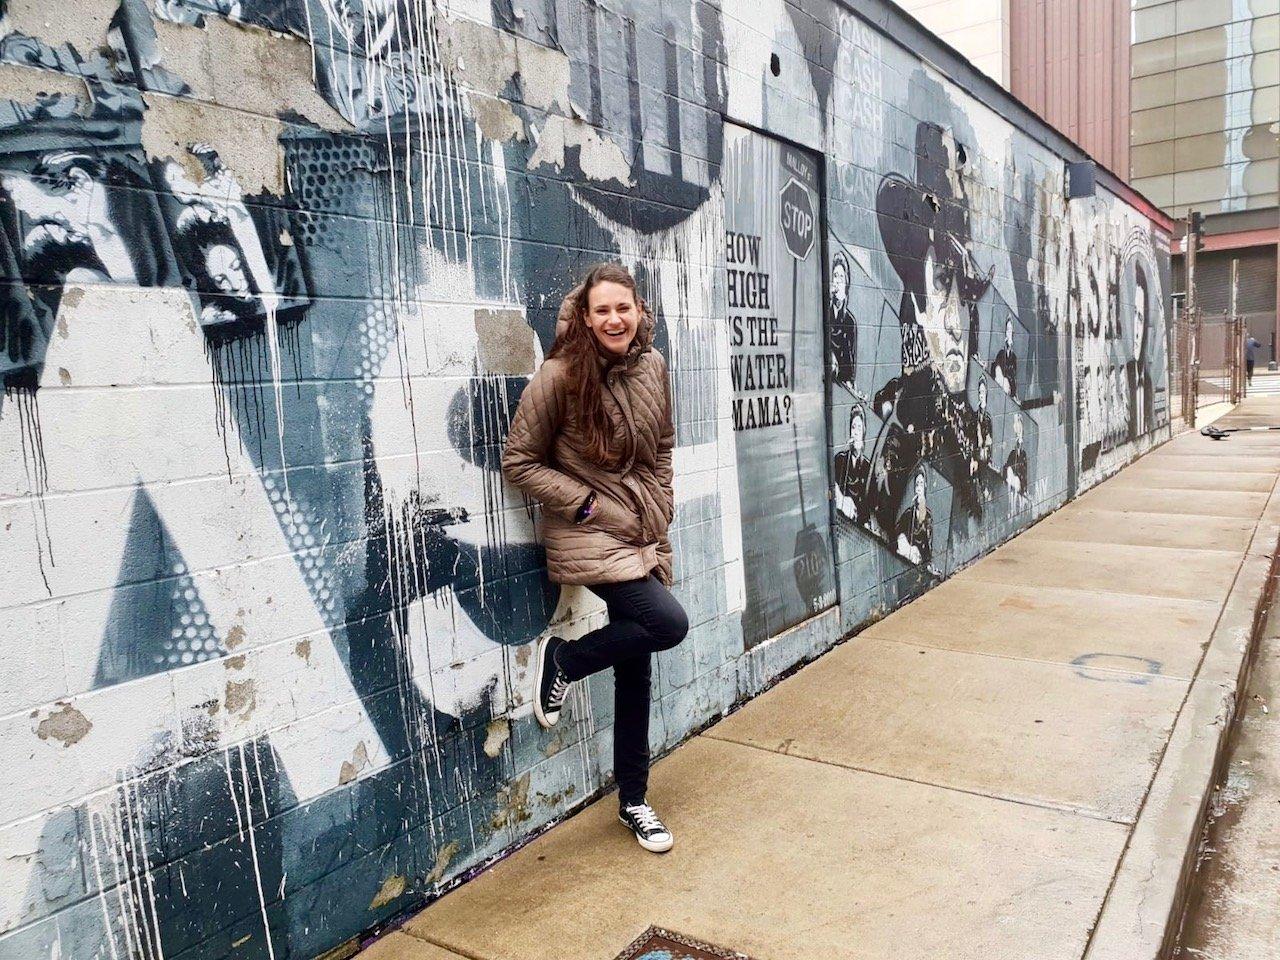 Nicola in Nashville